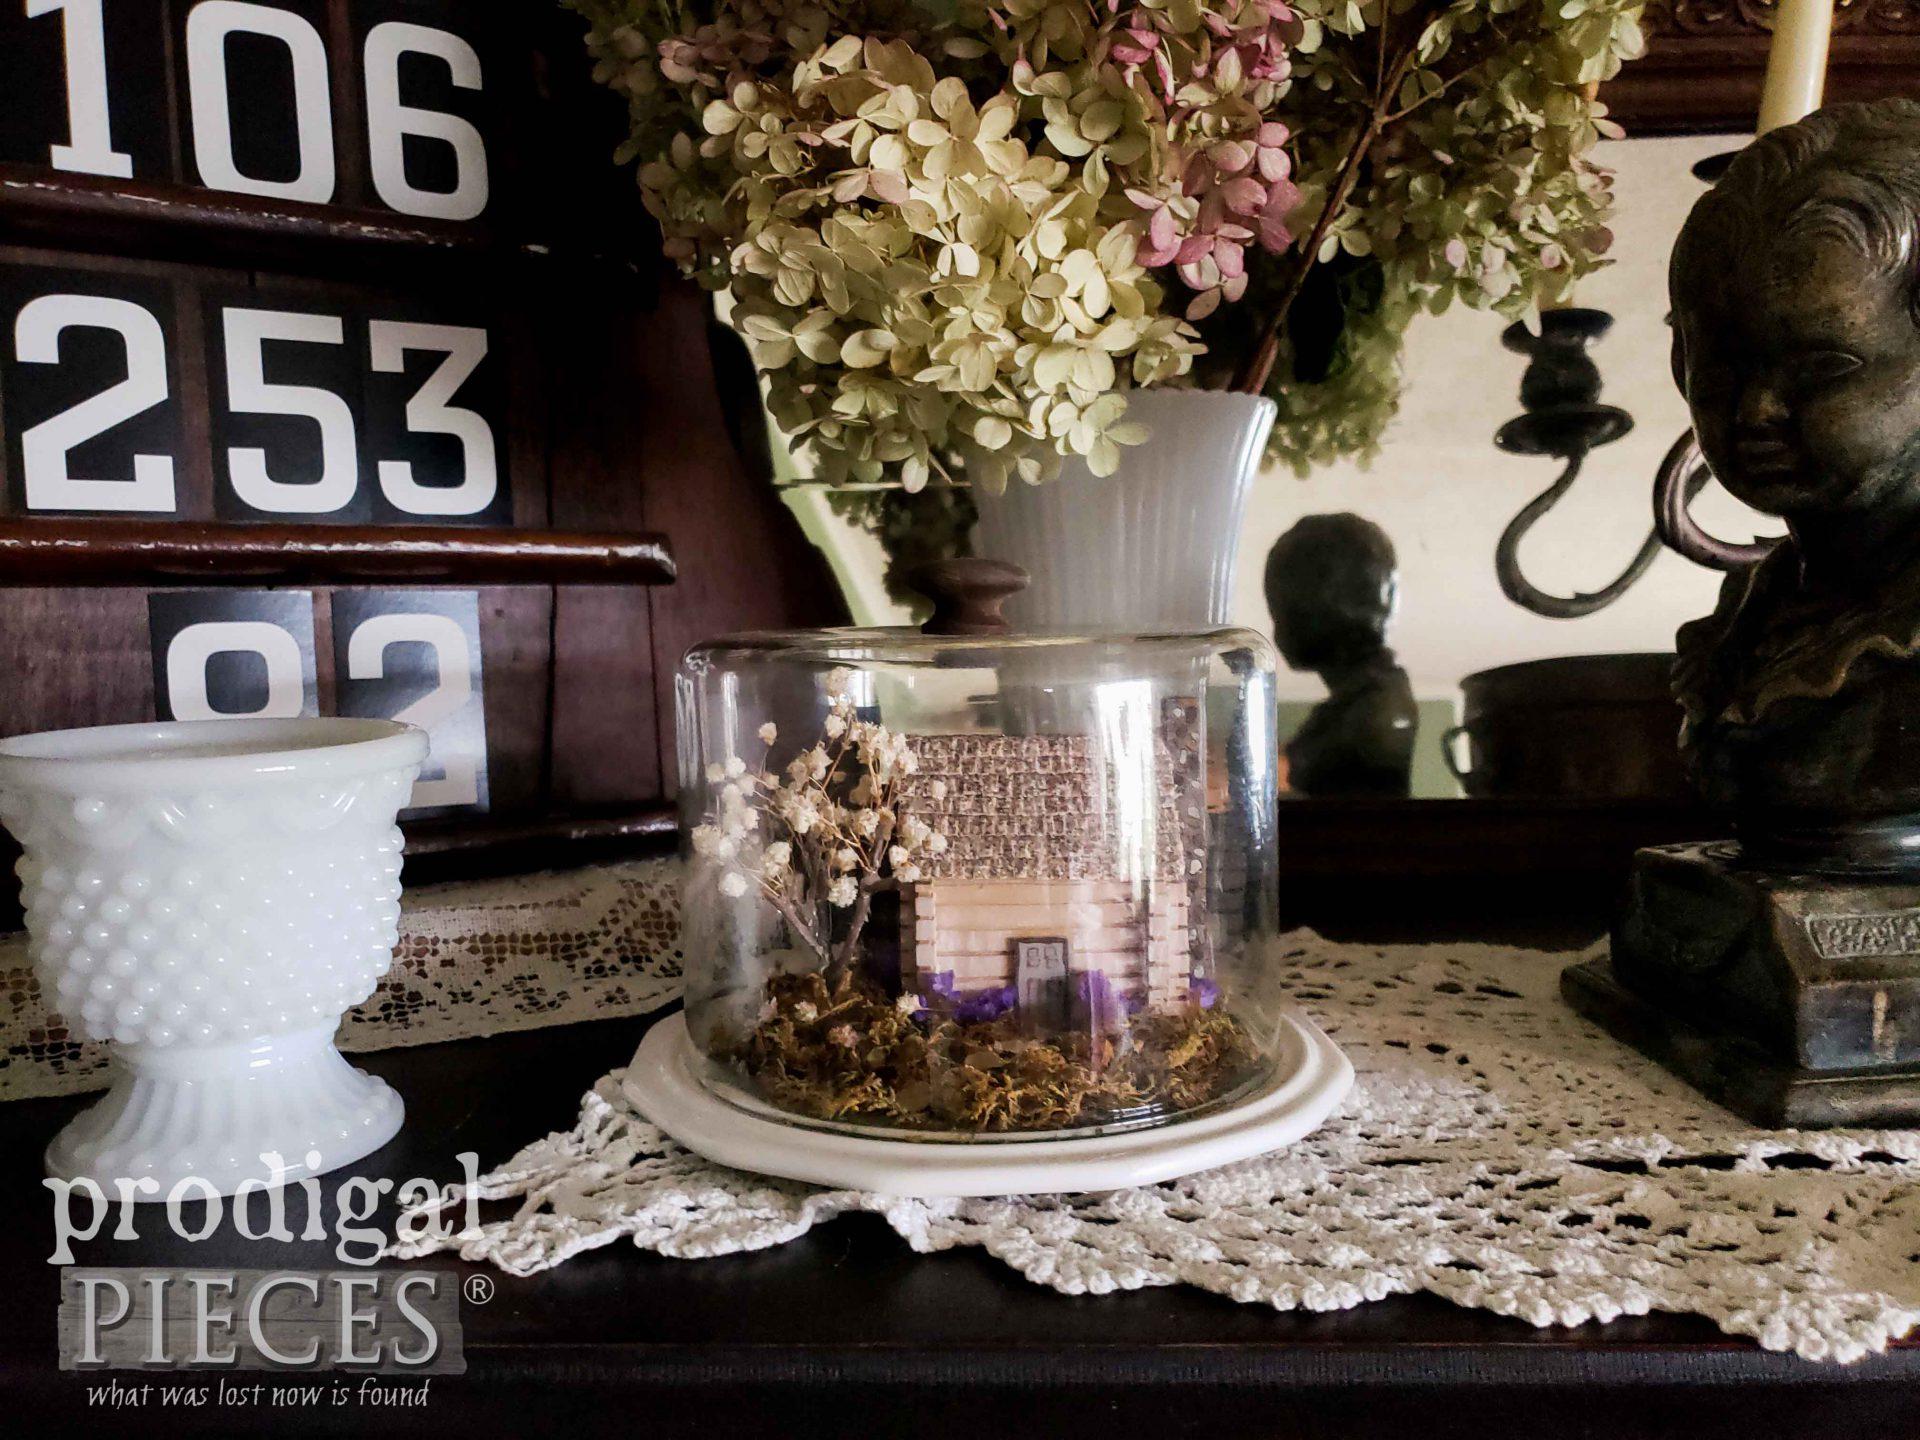 Miniature Home Cloche made by Larissa of Prodigal Pieces | prodigalpieces.com #prodigalpieces #coronavirus #covid19 #quarantine #home #homedecor